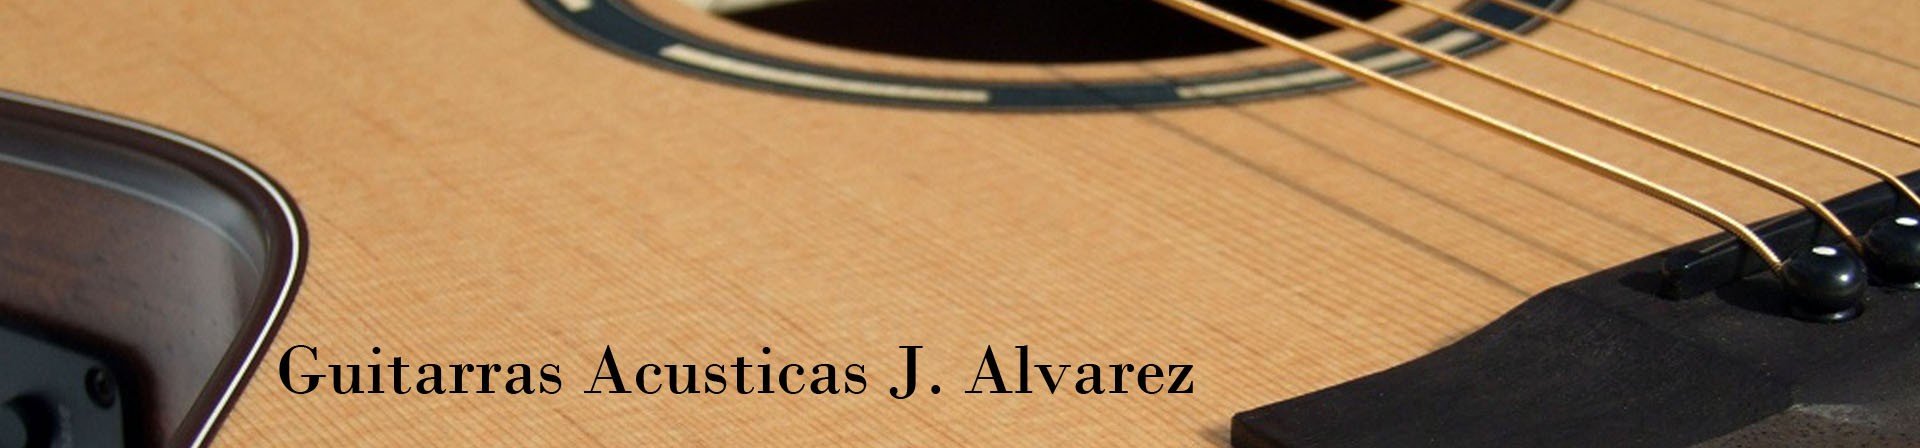 guitarras j. alvarez